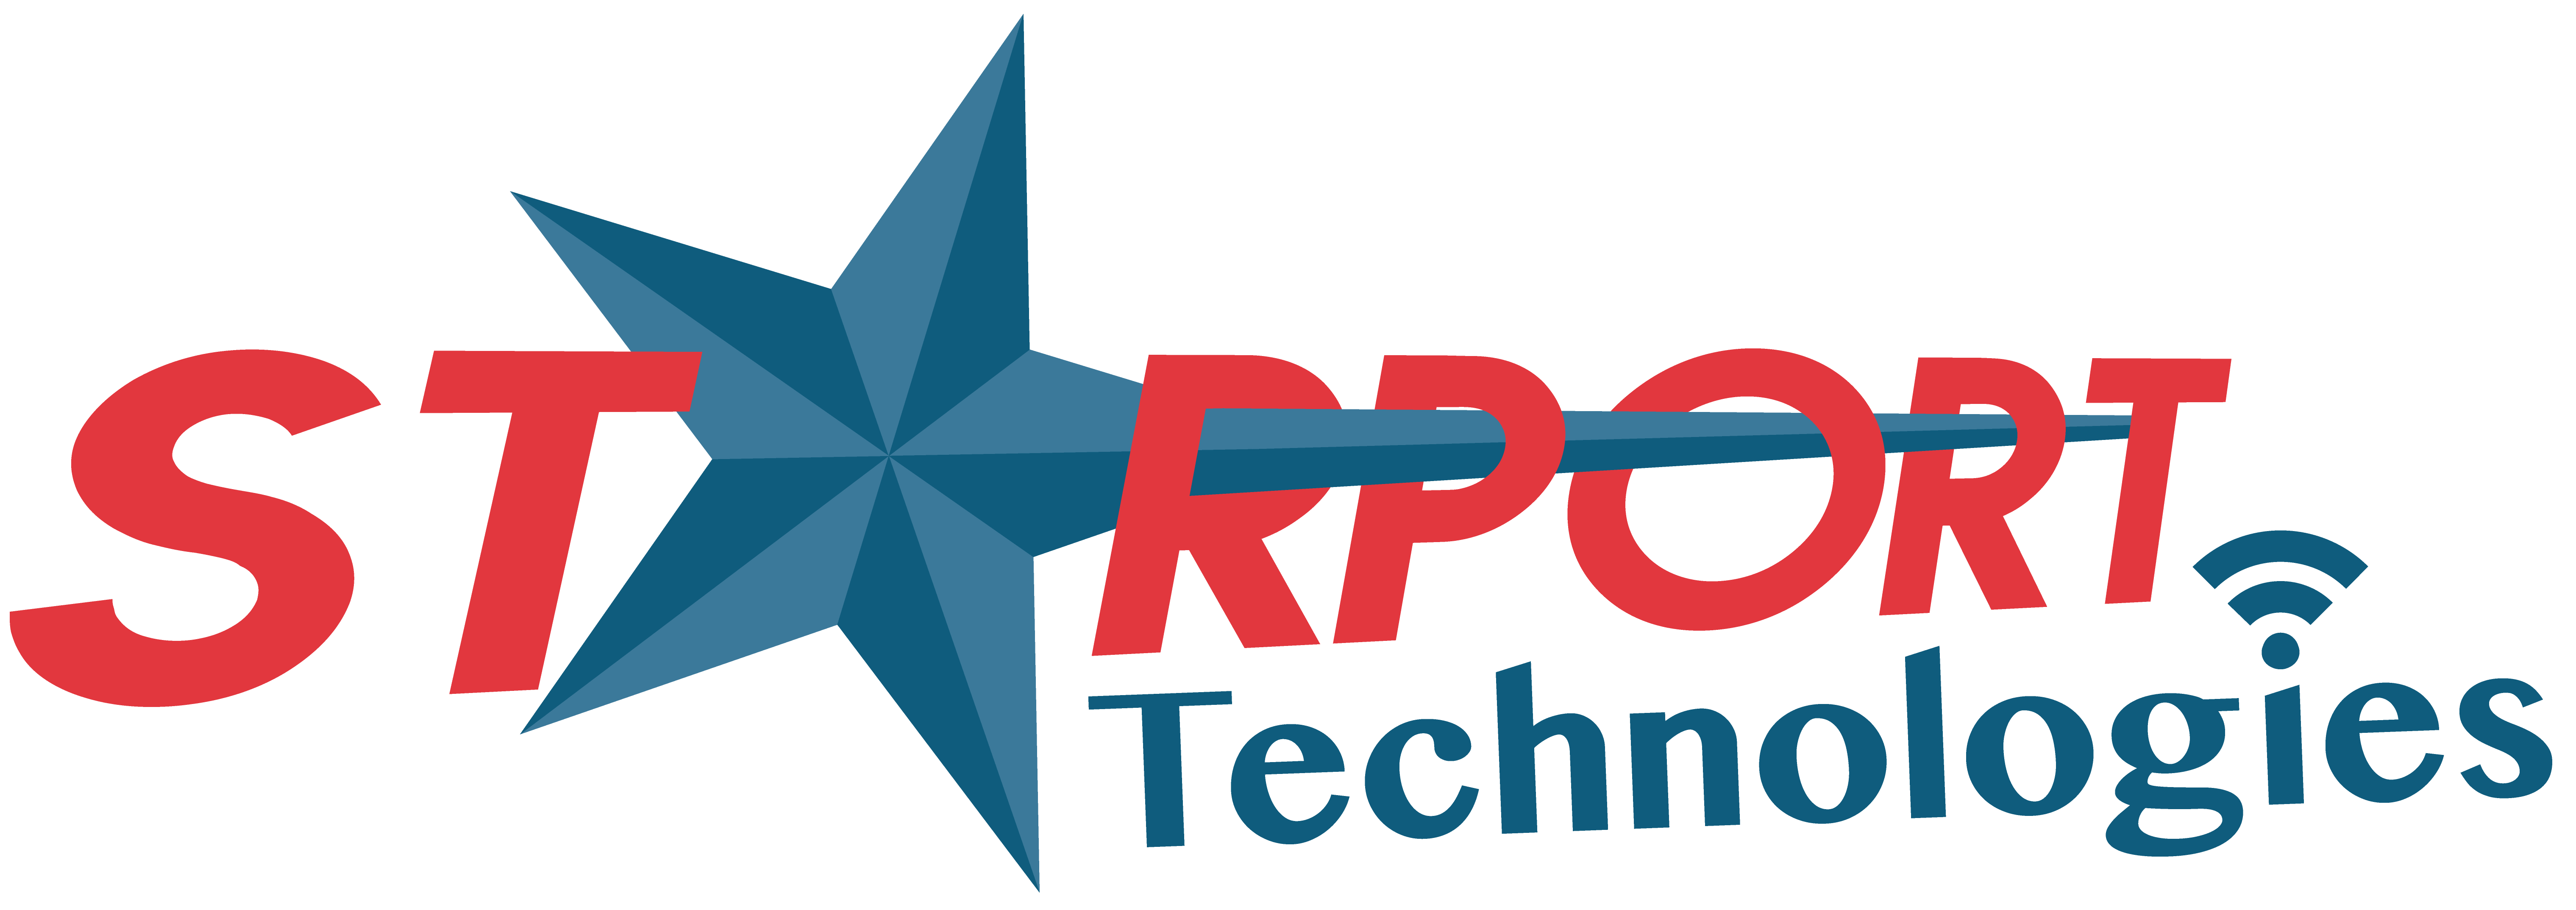 Starport-Logo